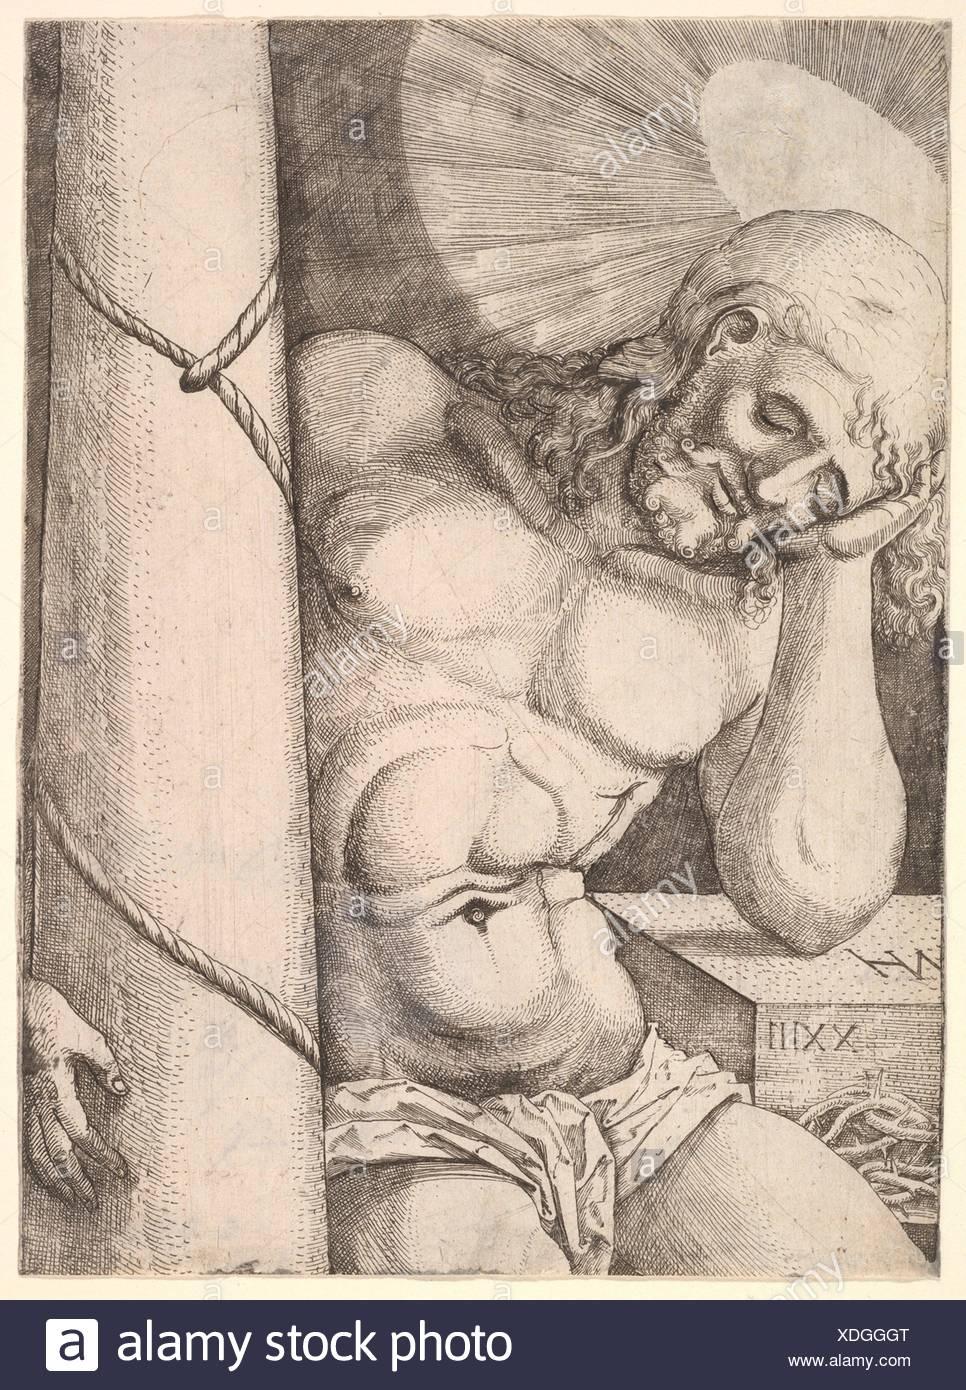 The Man of Sorrows at the Column. Artist: Nikolaus Hogenberg (Netherlandish, Munich ca. 1500-1539 Mechelen); Date: 1523; Medium: Etching; Dimensions: - Stock Image